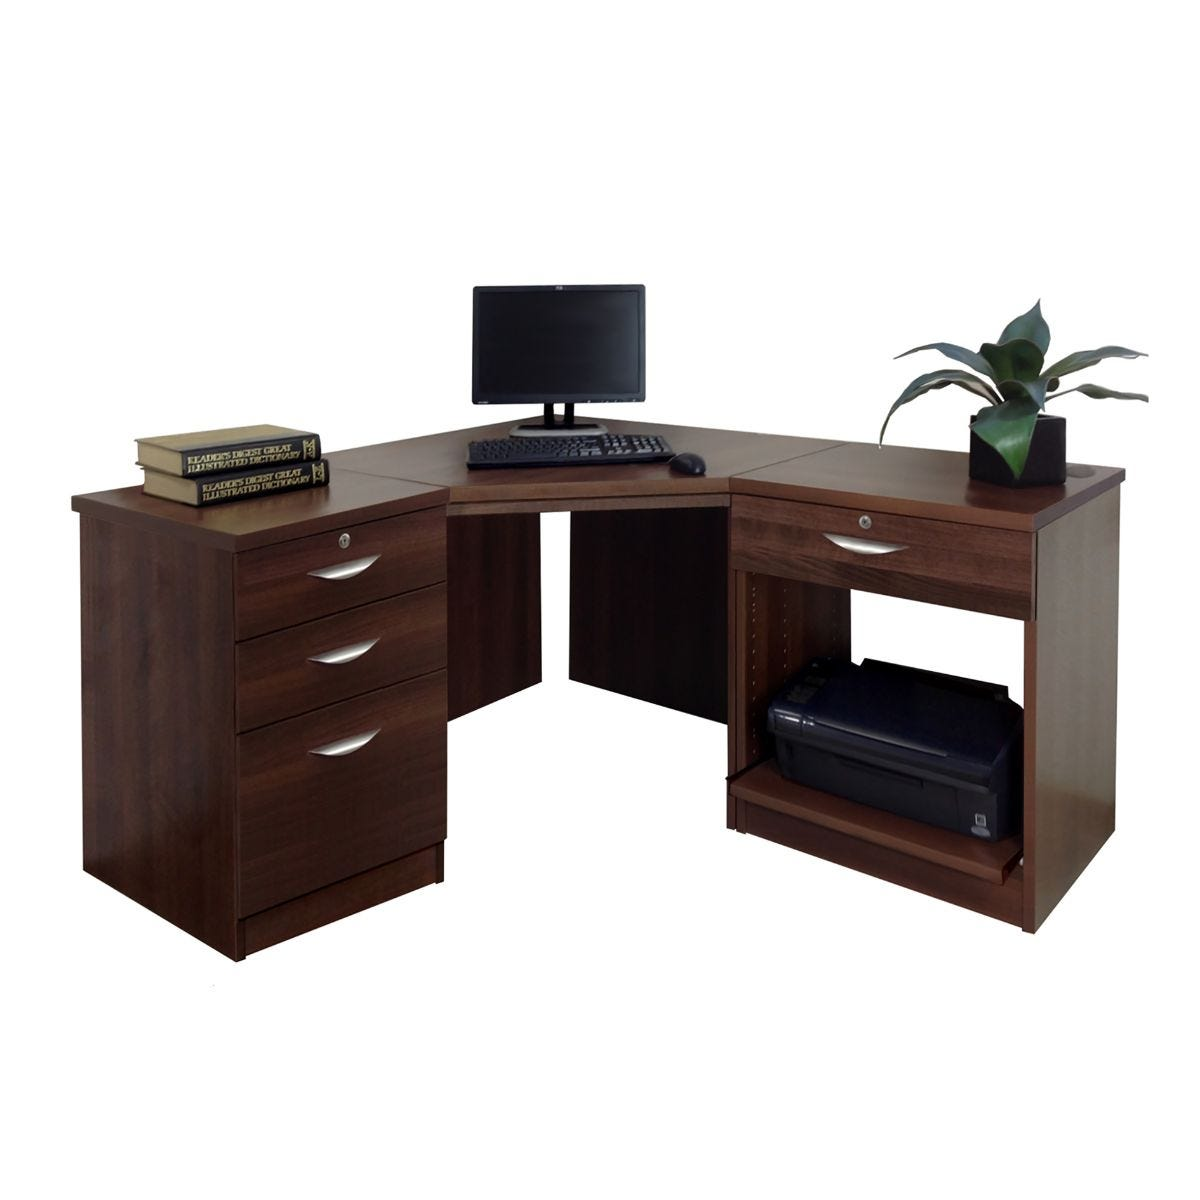 R White Home Office Corner Desk, Walnut Wood Grain